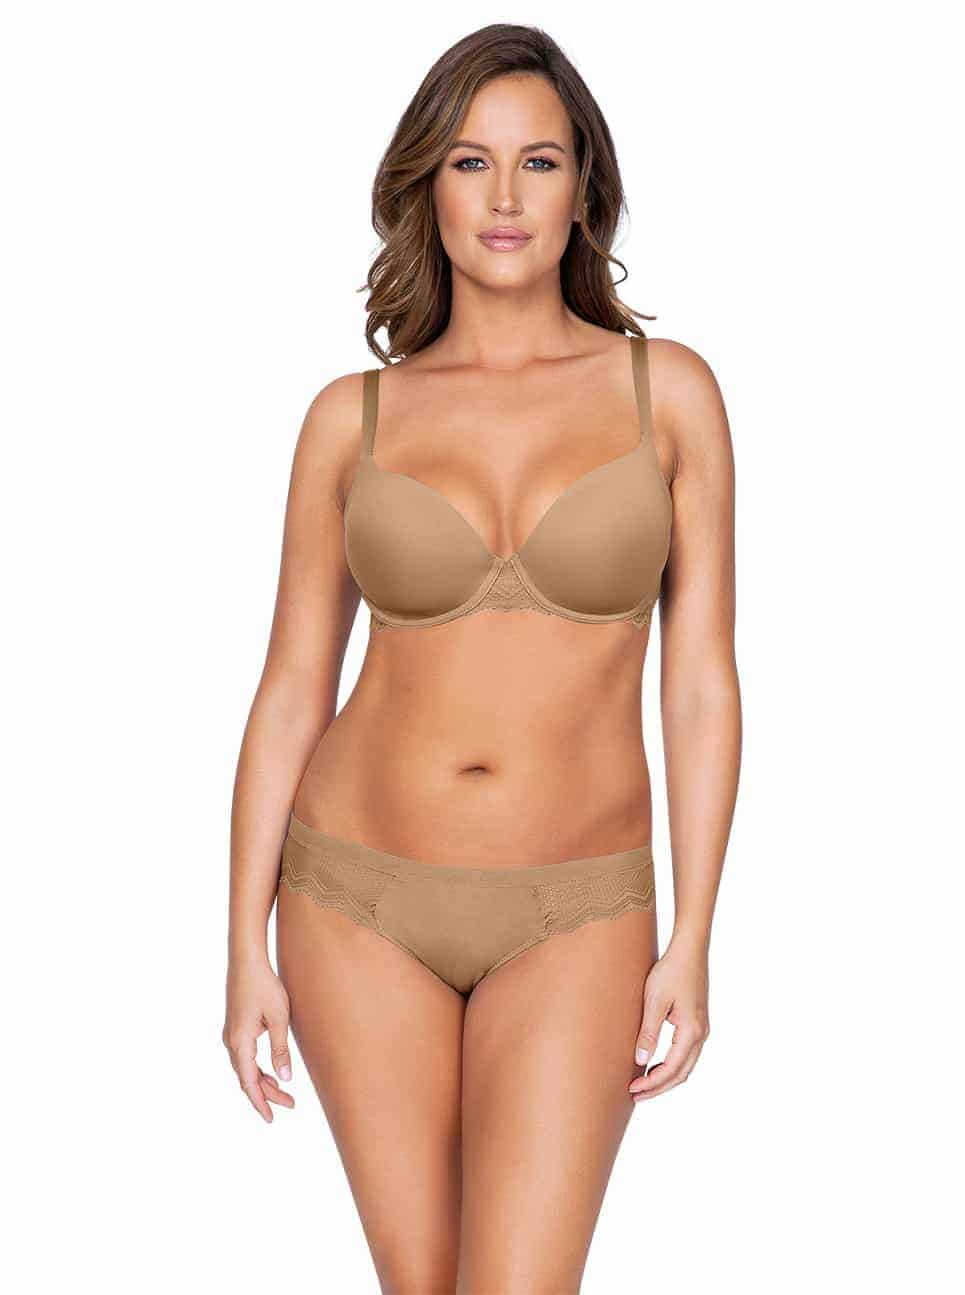 Lydie P5441ContourPadded P5443 Bikini NudeFront copy - Lydie Bikini – European Nude – P5443